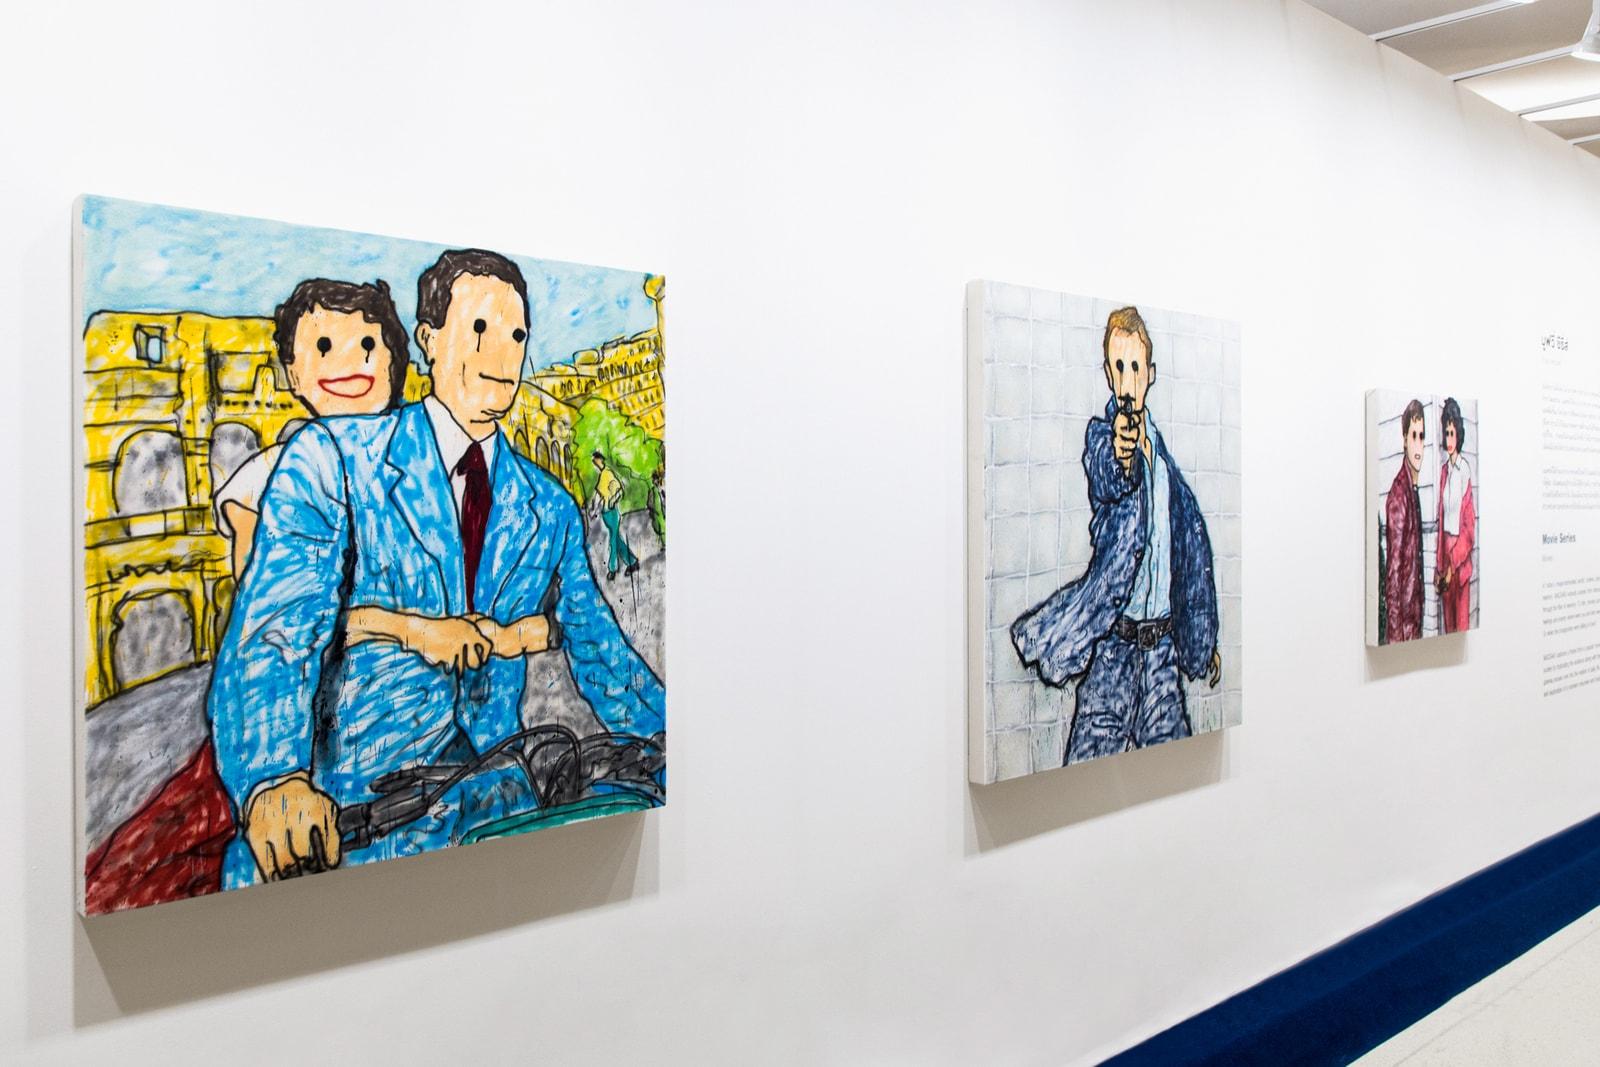 madsaki kaikai kiki interview bangkok thailand central embassy galerie perrotin